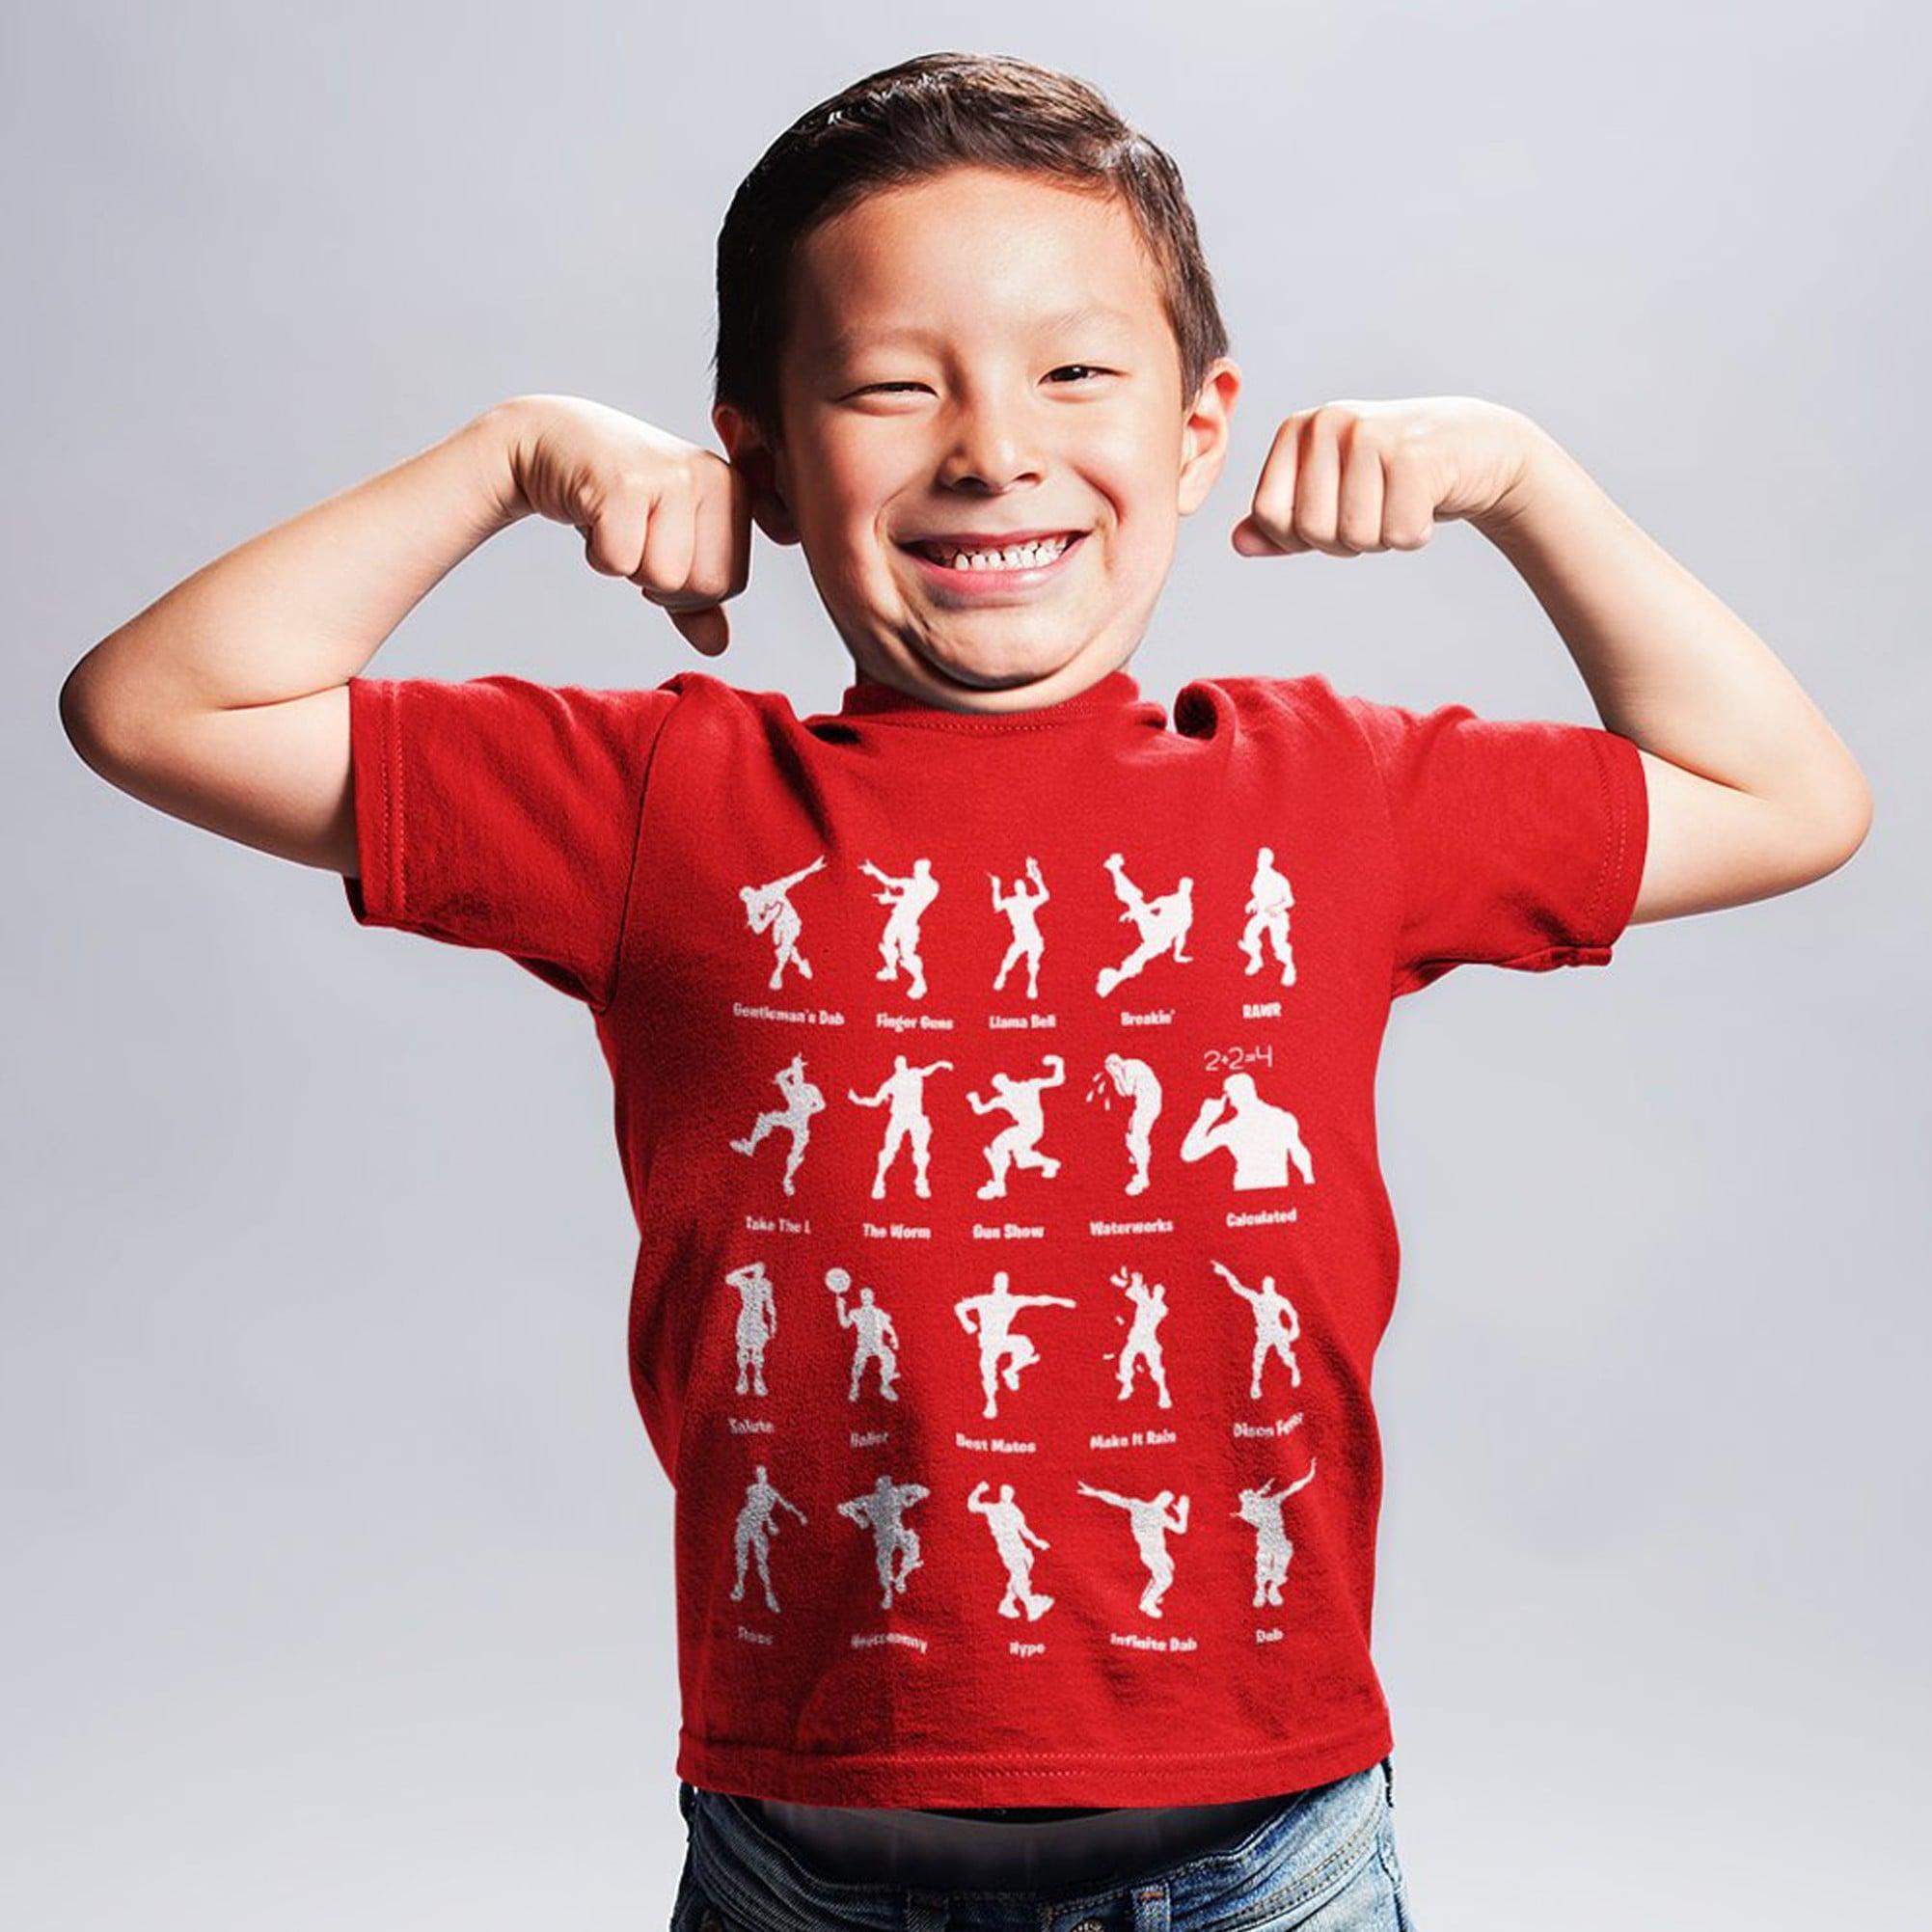 Gifts for boys son teens birthday gift ideas Eat Sleep Gaming T-Shirt